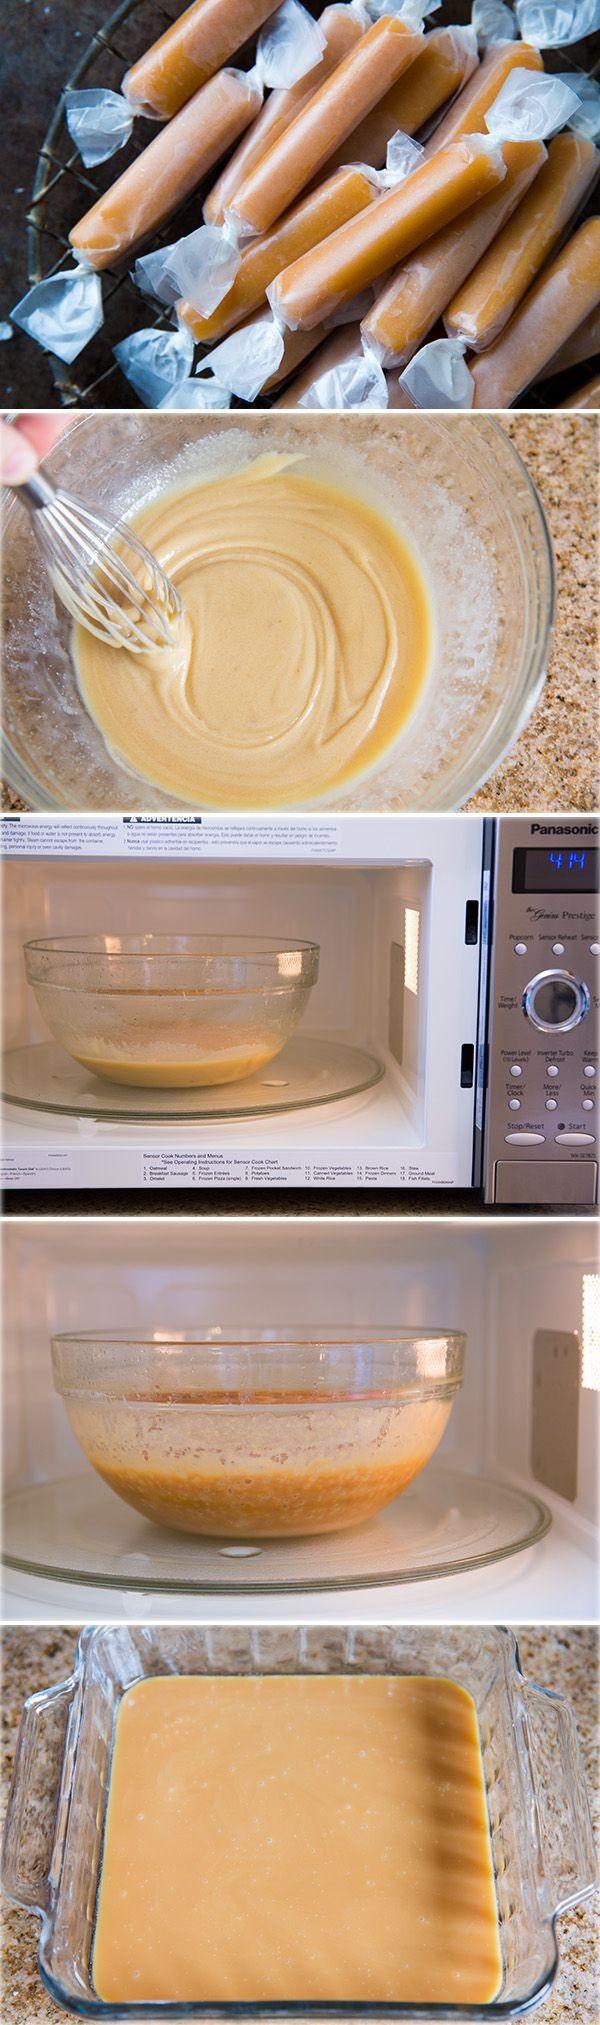 microwave snacks3